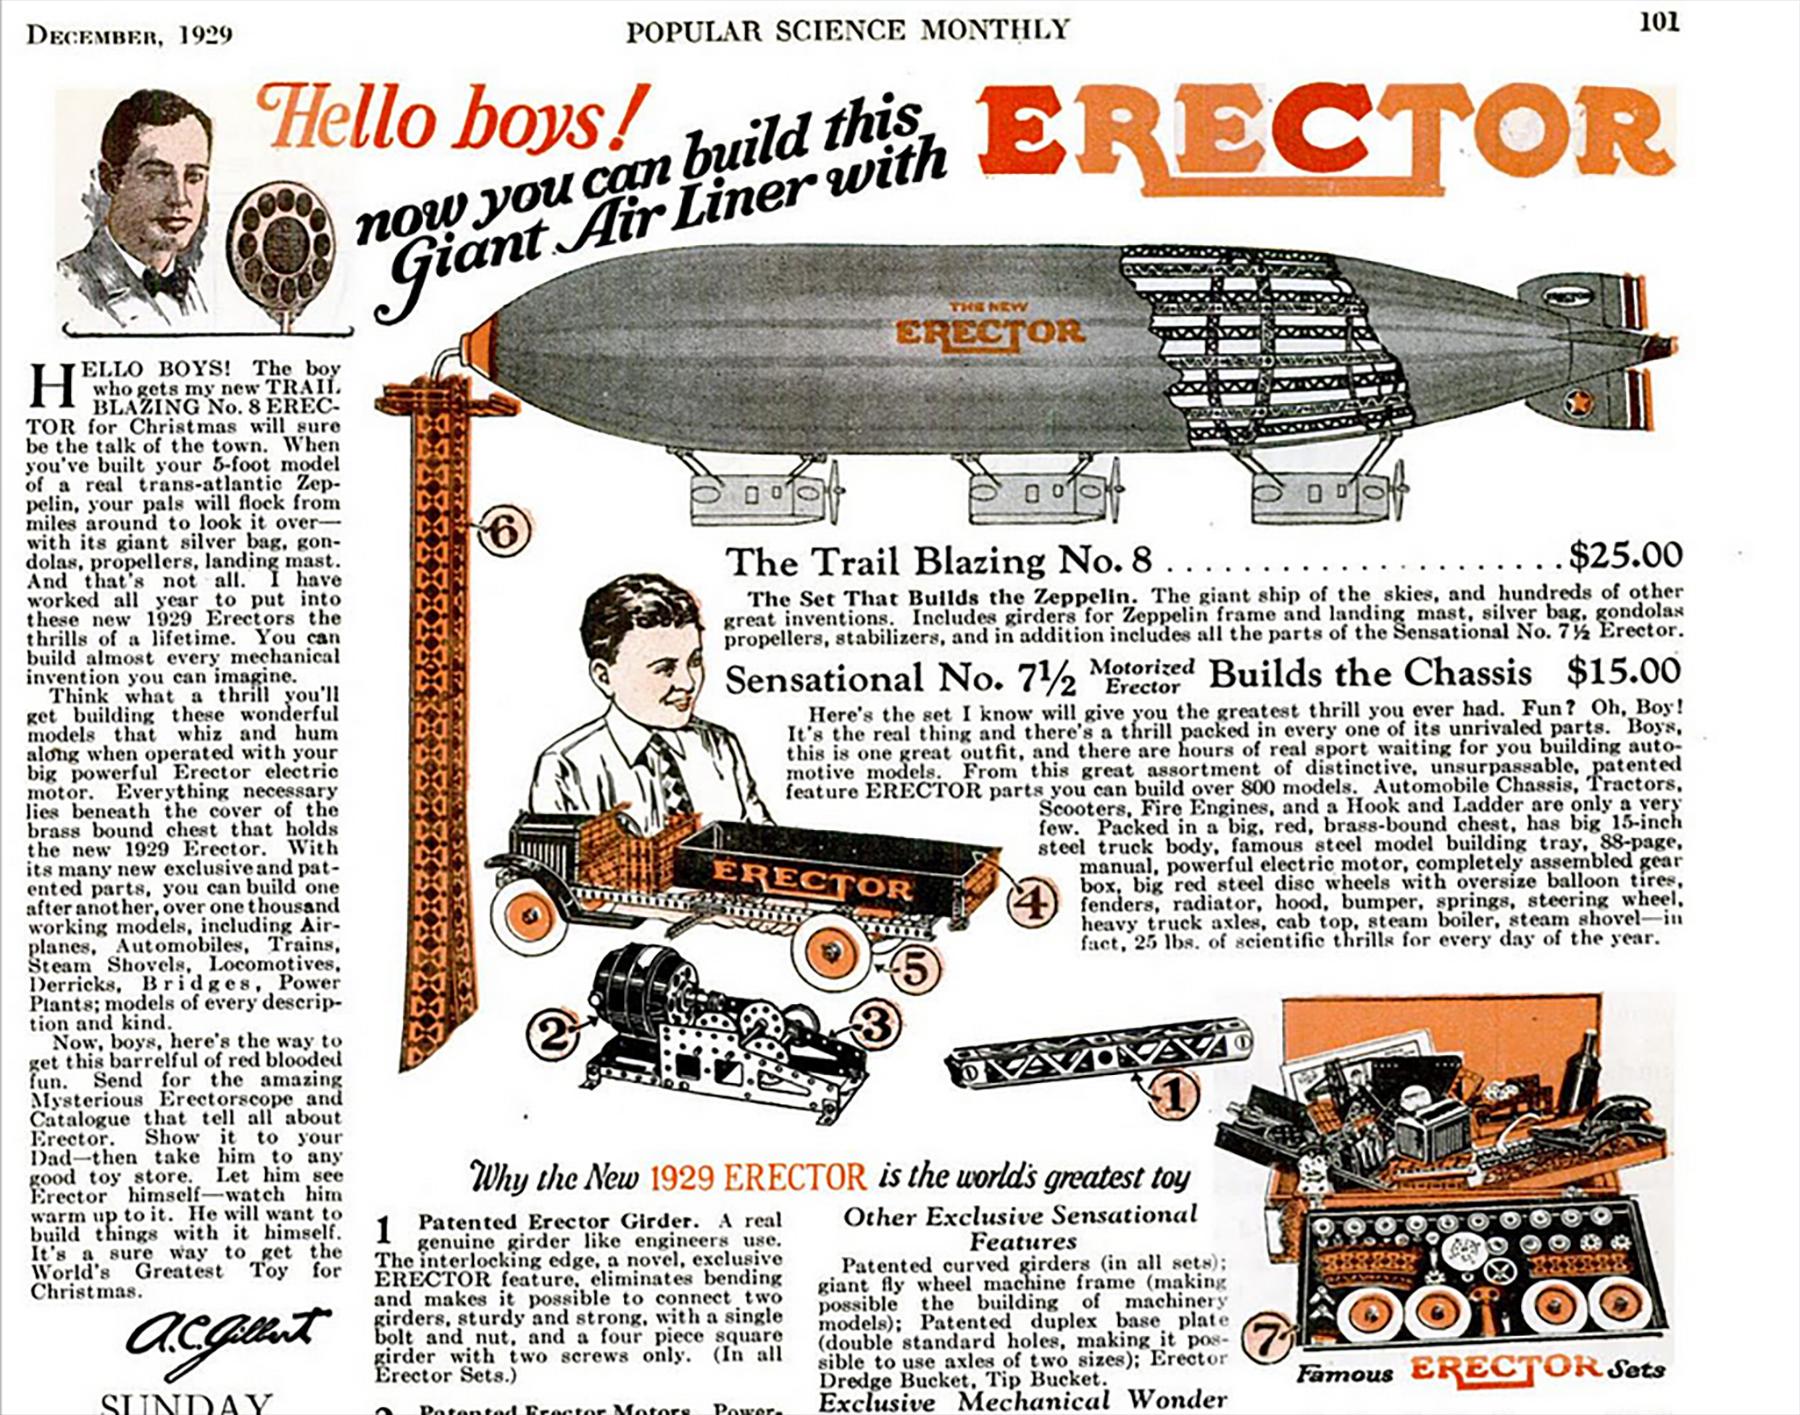 even as a boy erector set s inventor seemed larger than